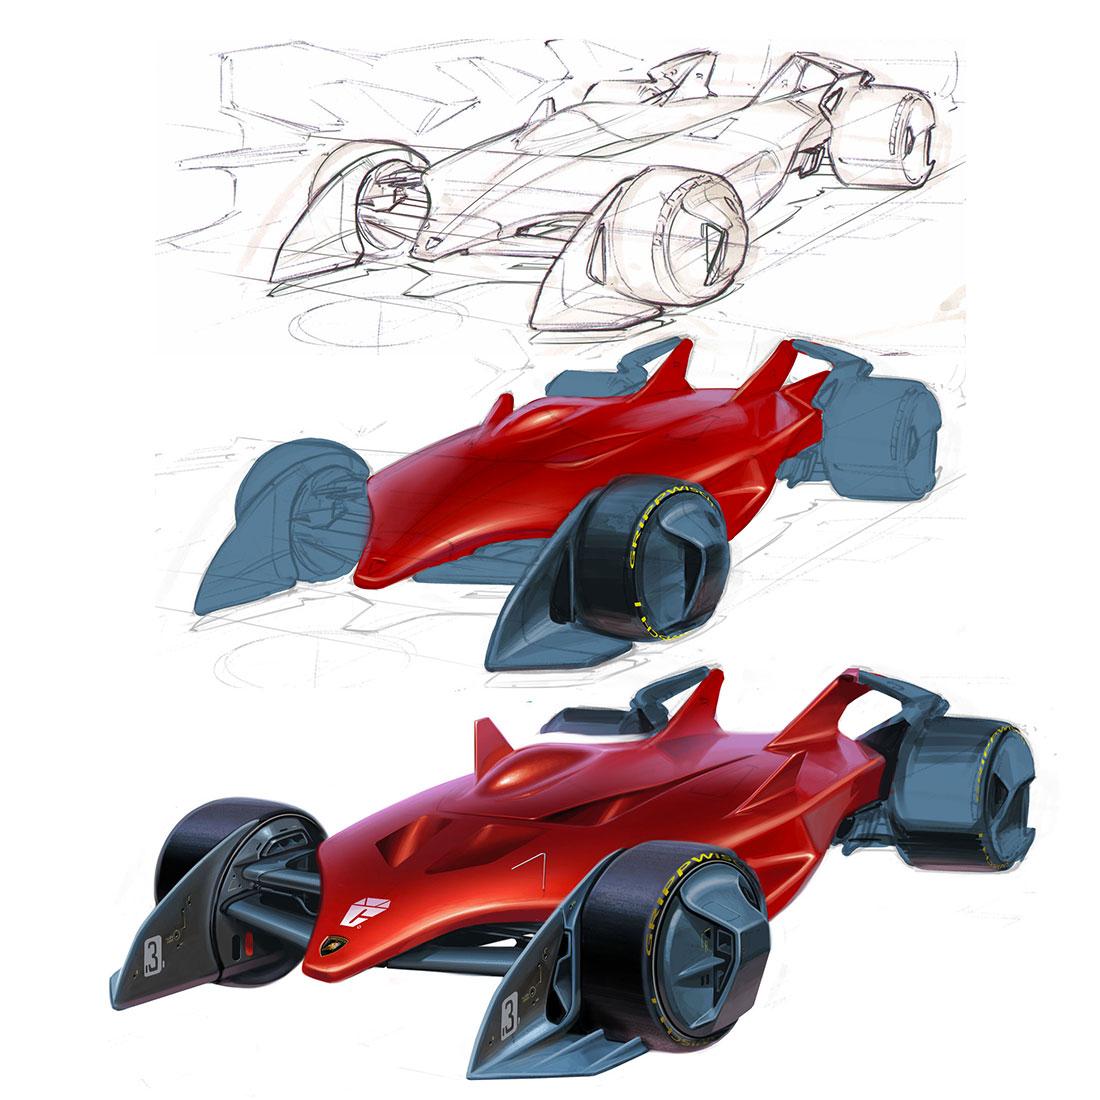 Formula 1 Concept Design Sketch Tutorial by John Frye - Car